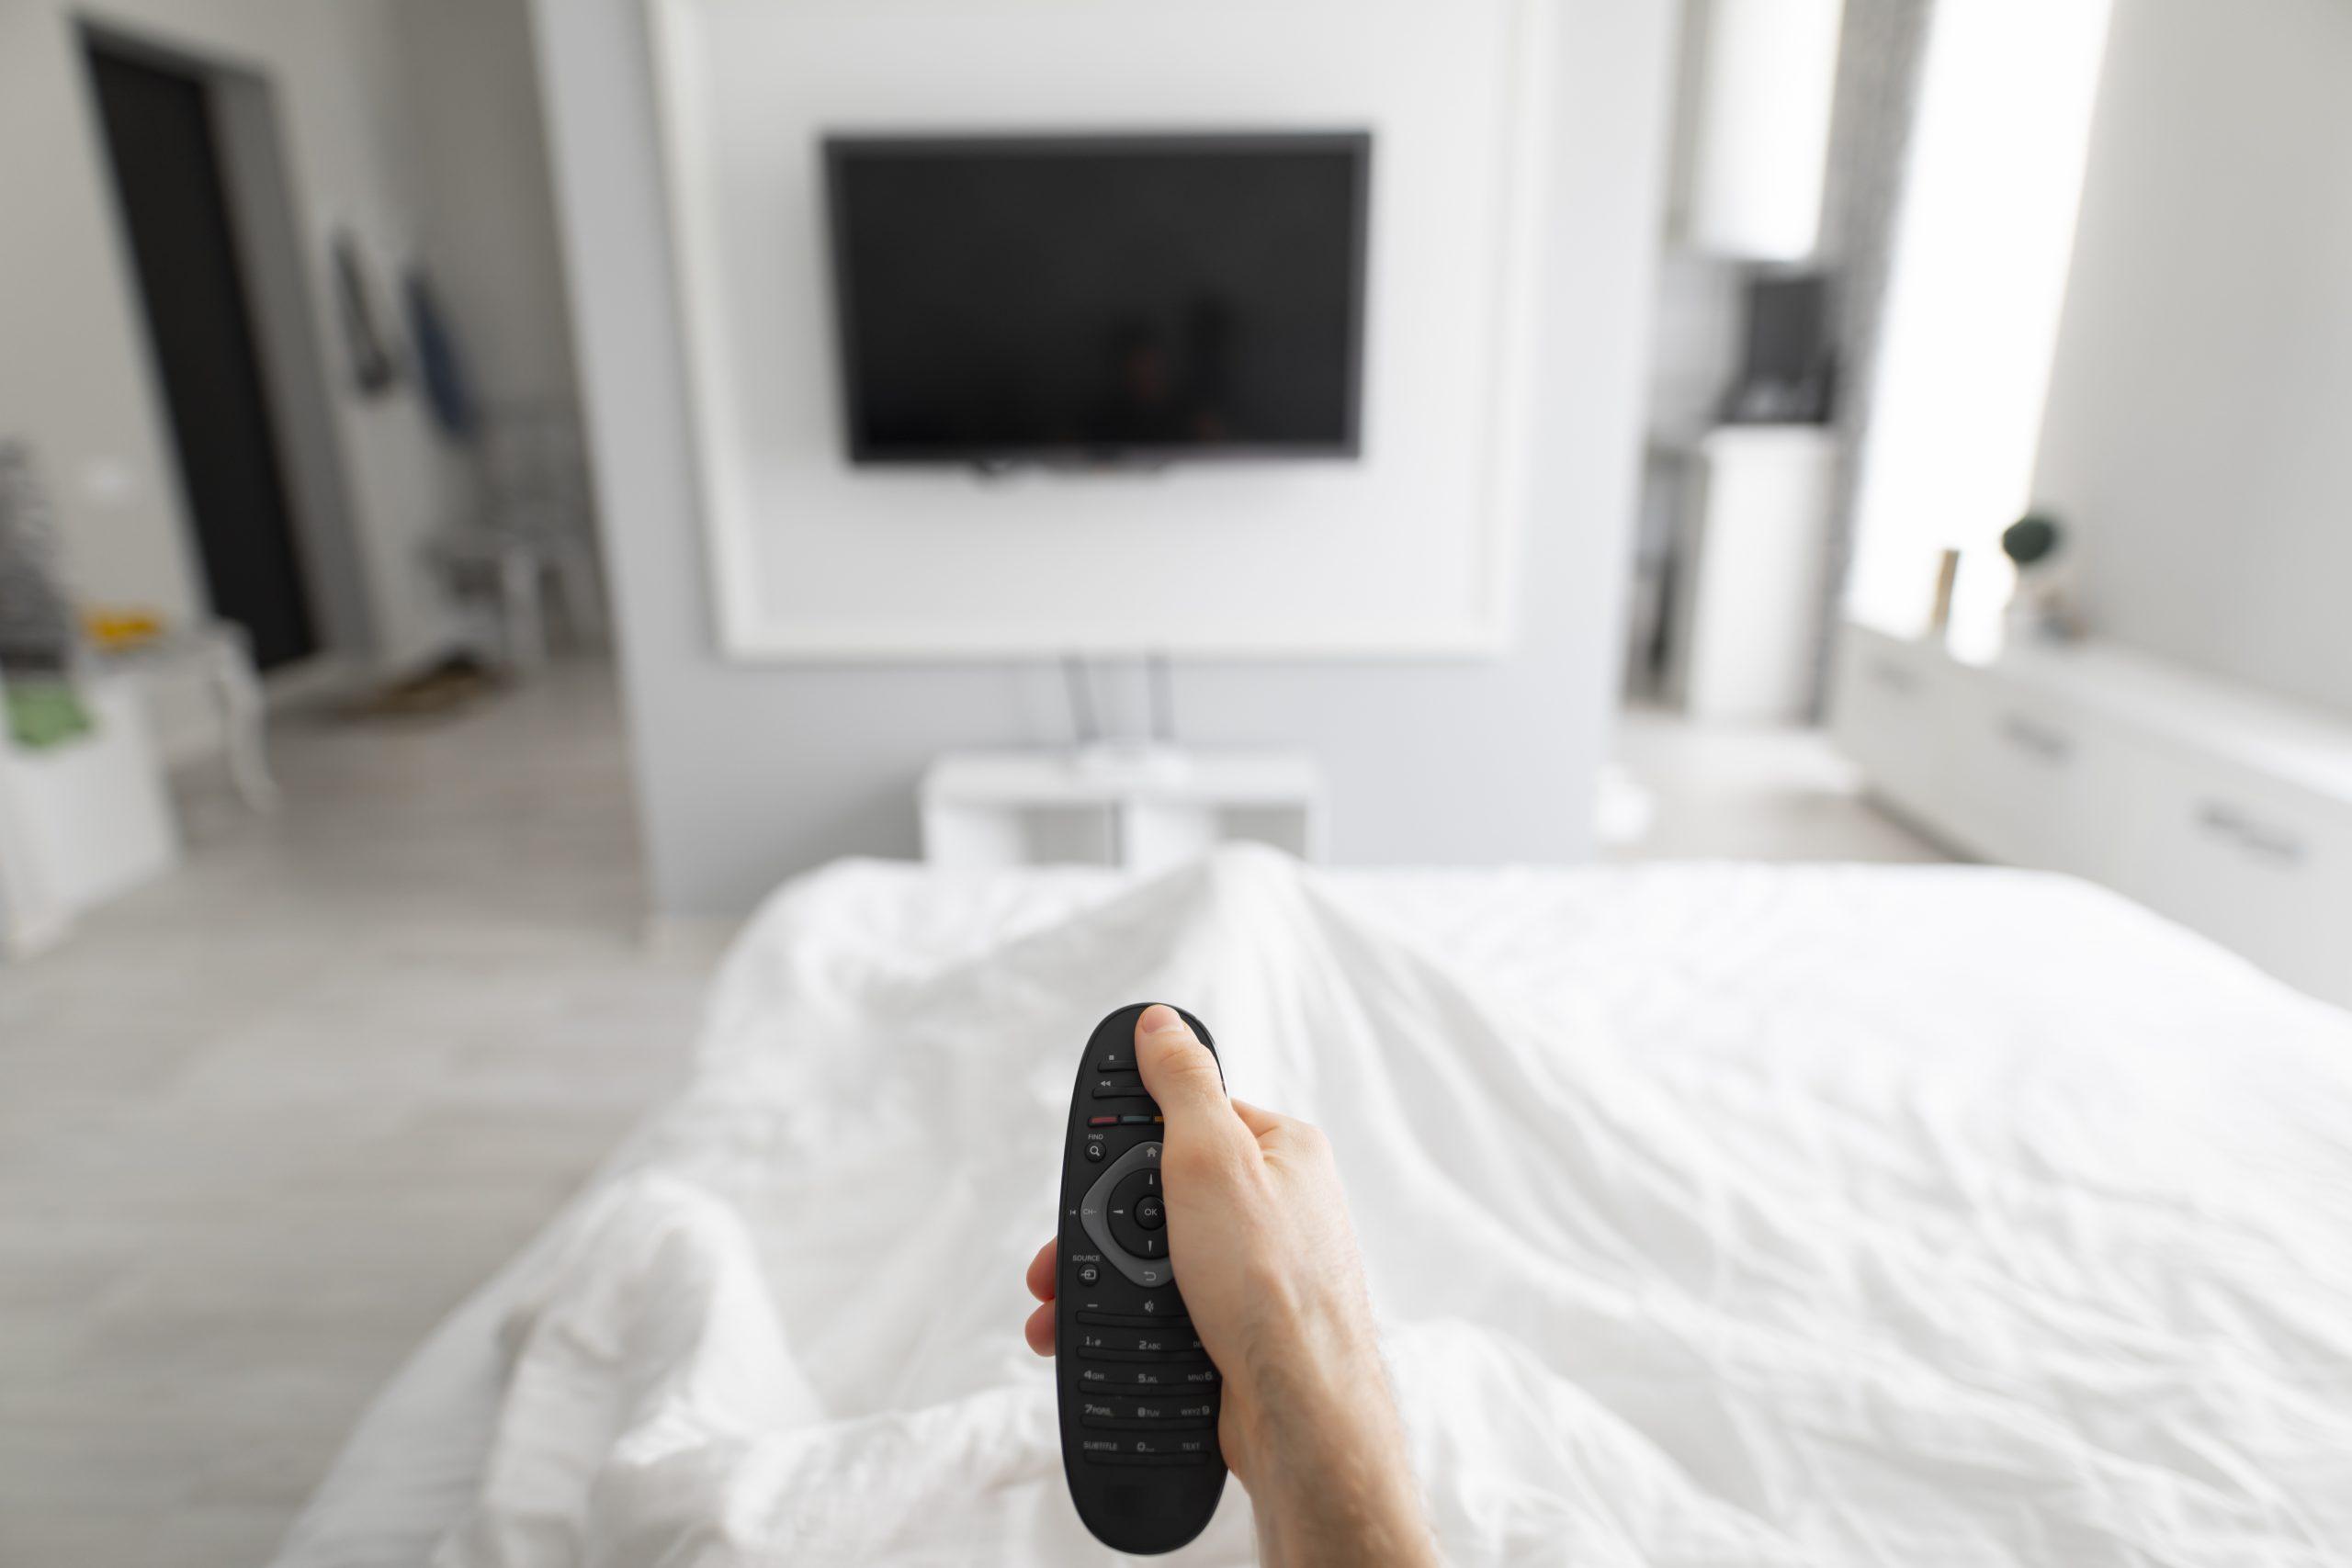 apparatuur in slaapkamer